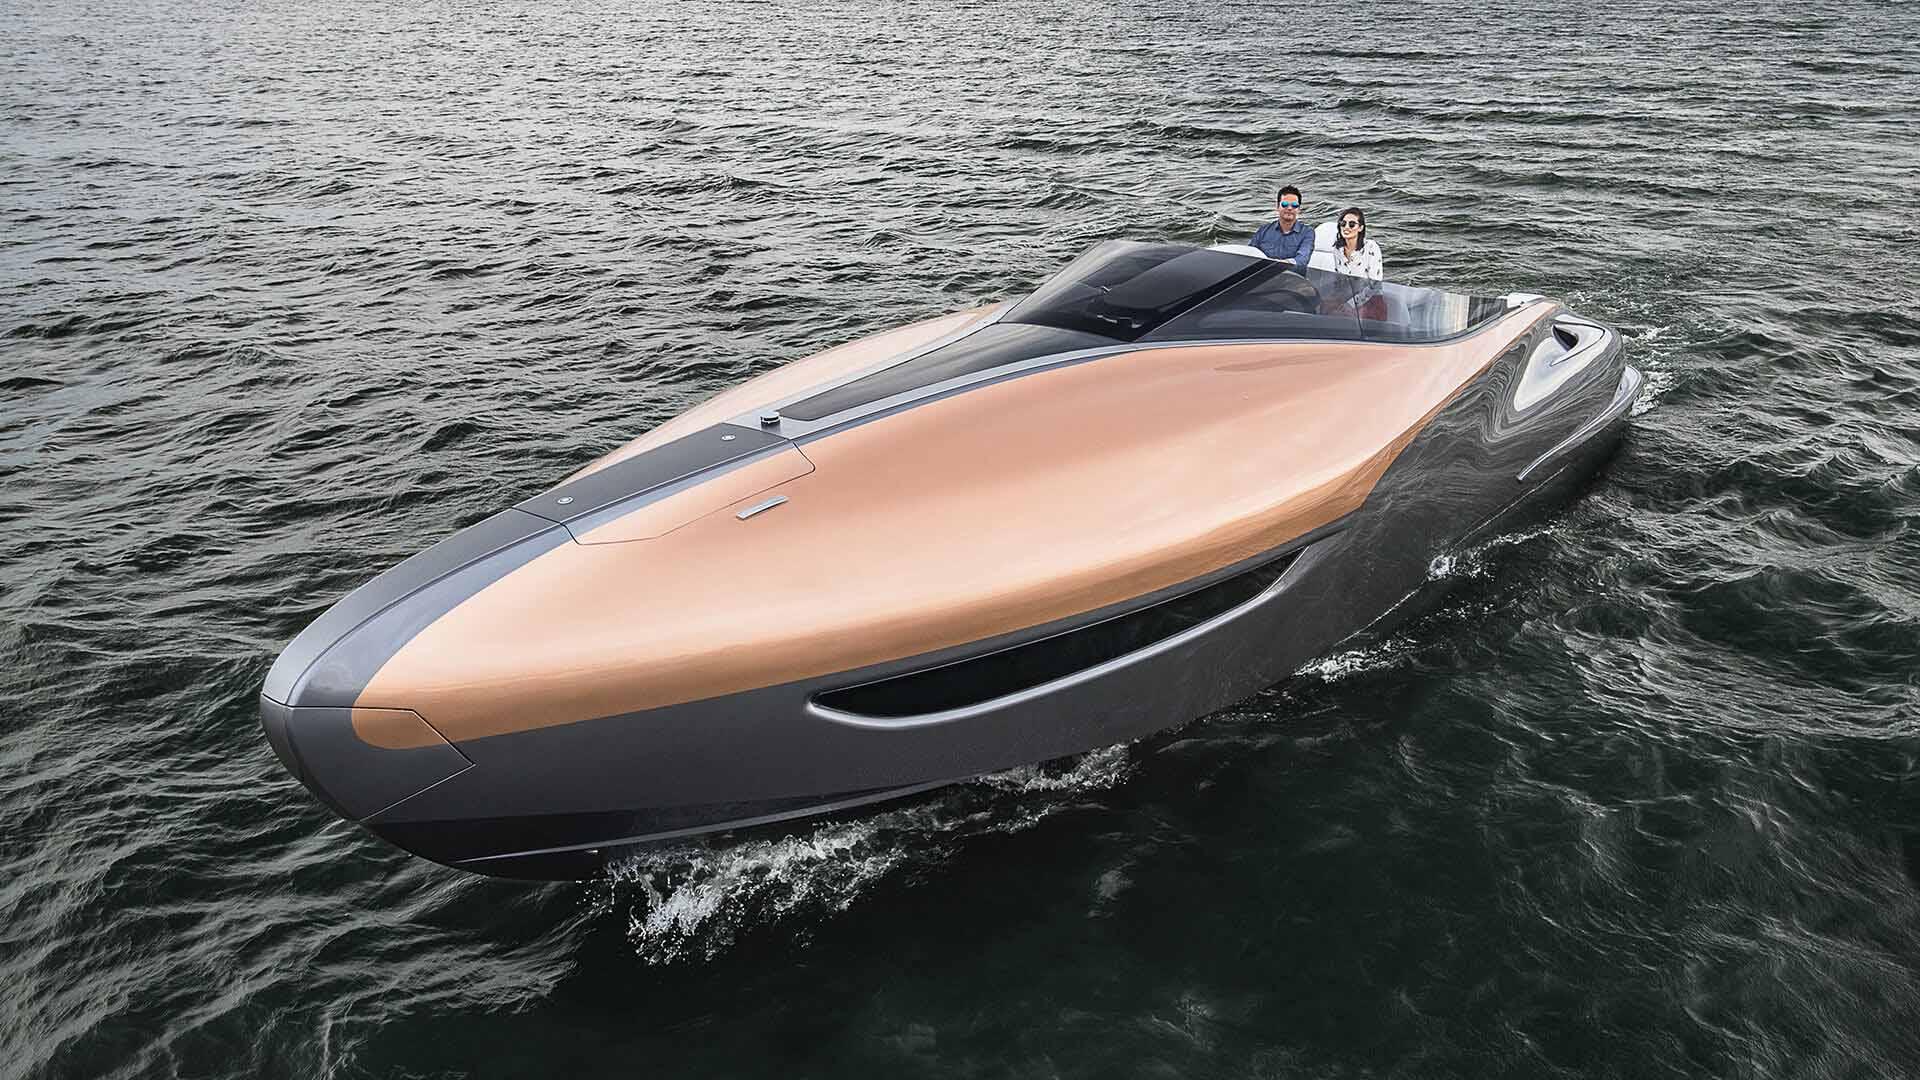 2017 lexus yacht gallery02